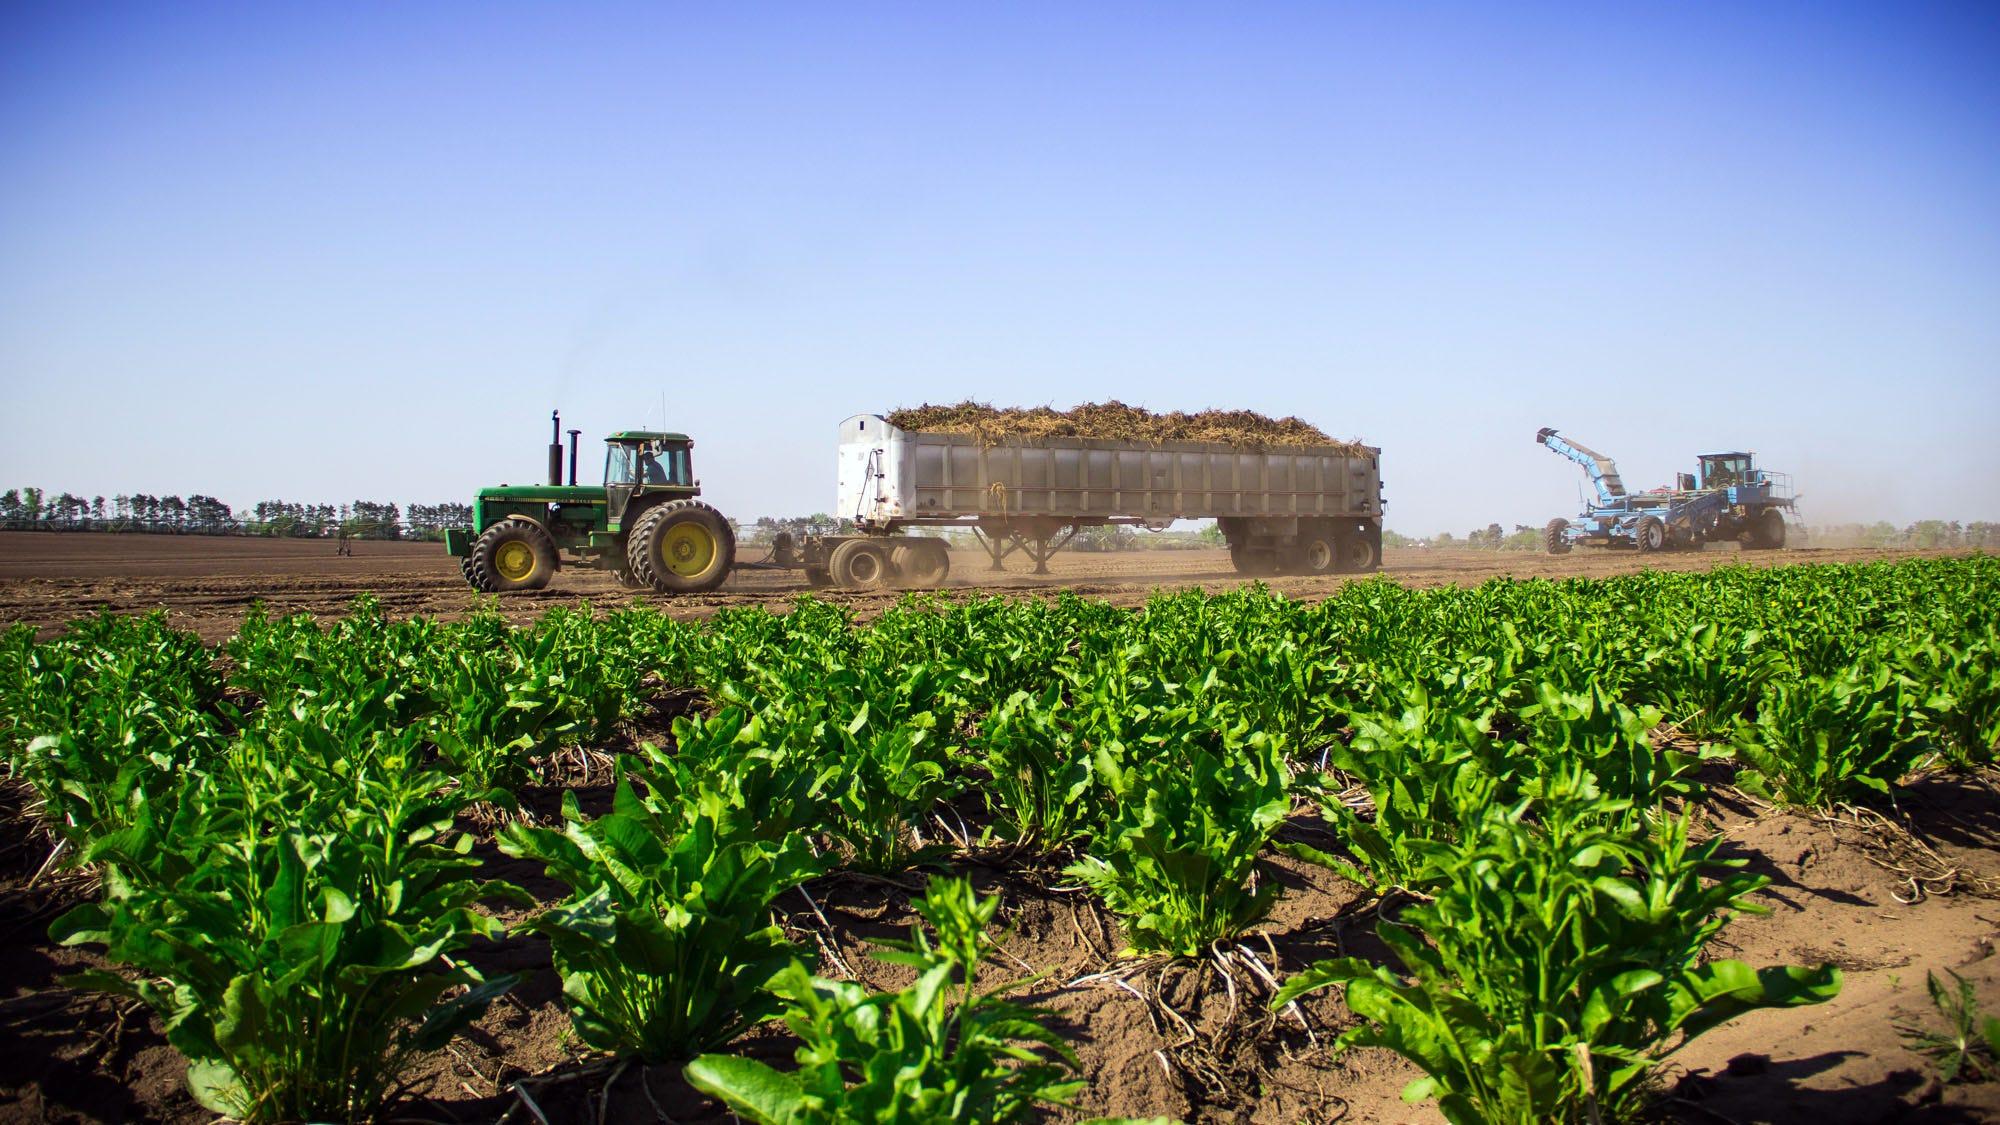 The world's largest producer of horseradish warns of shortage